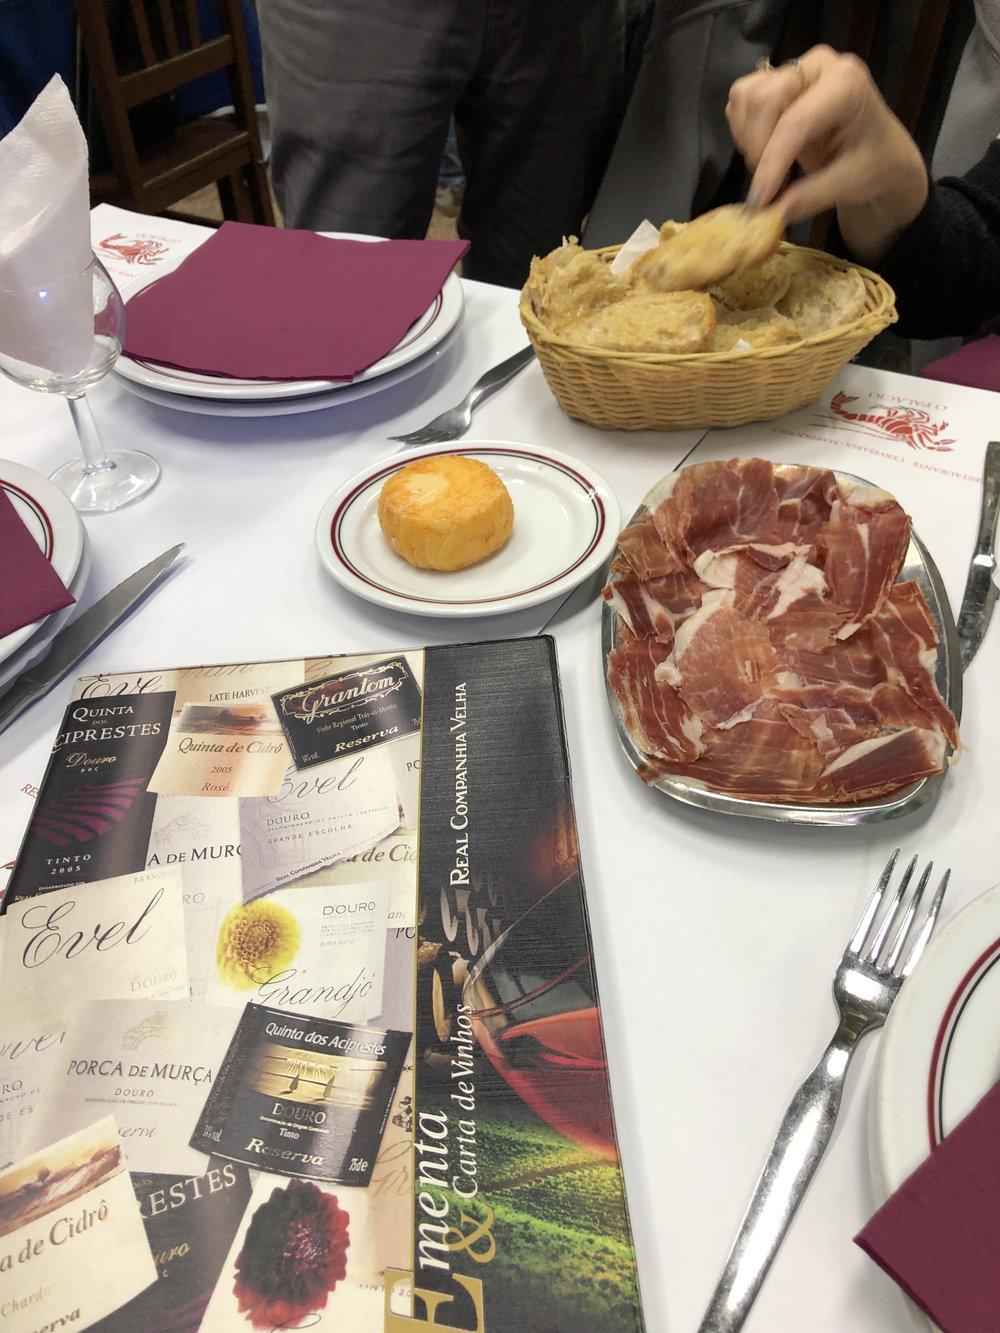 teri_lisbon_portugal_OPalacio_spiritedtable_photo08.jpg